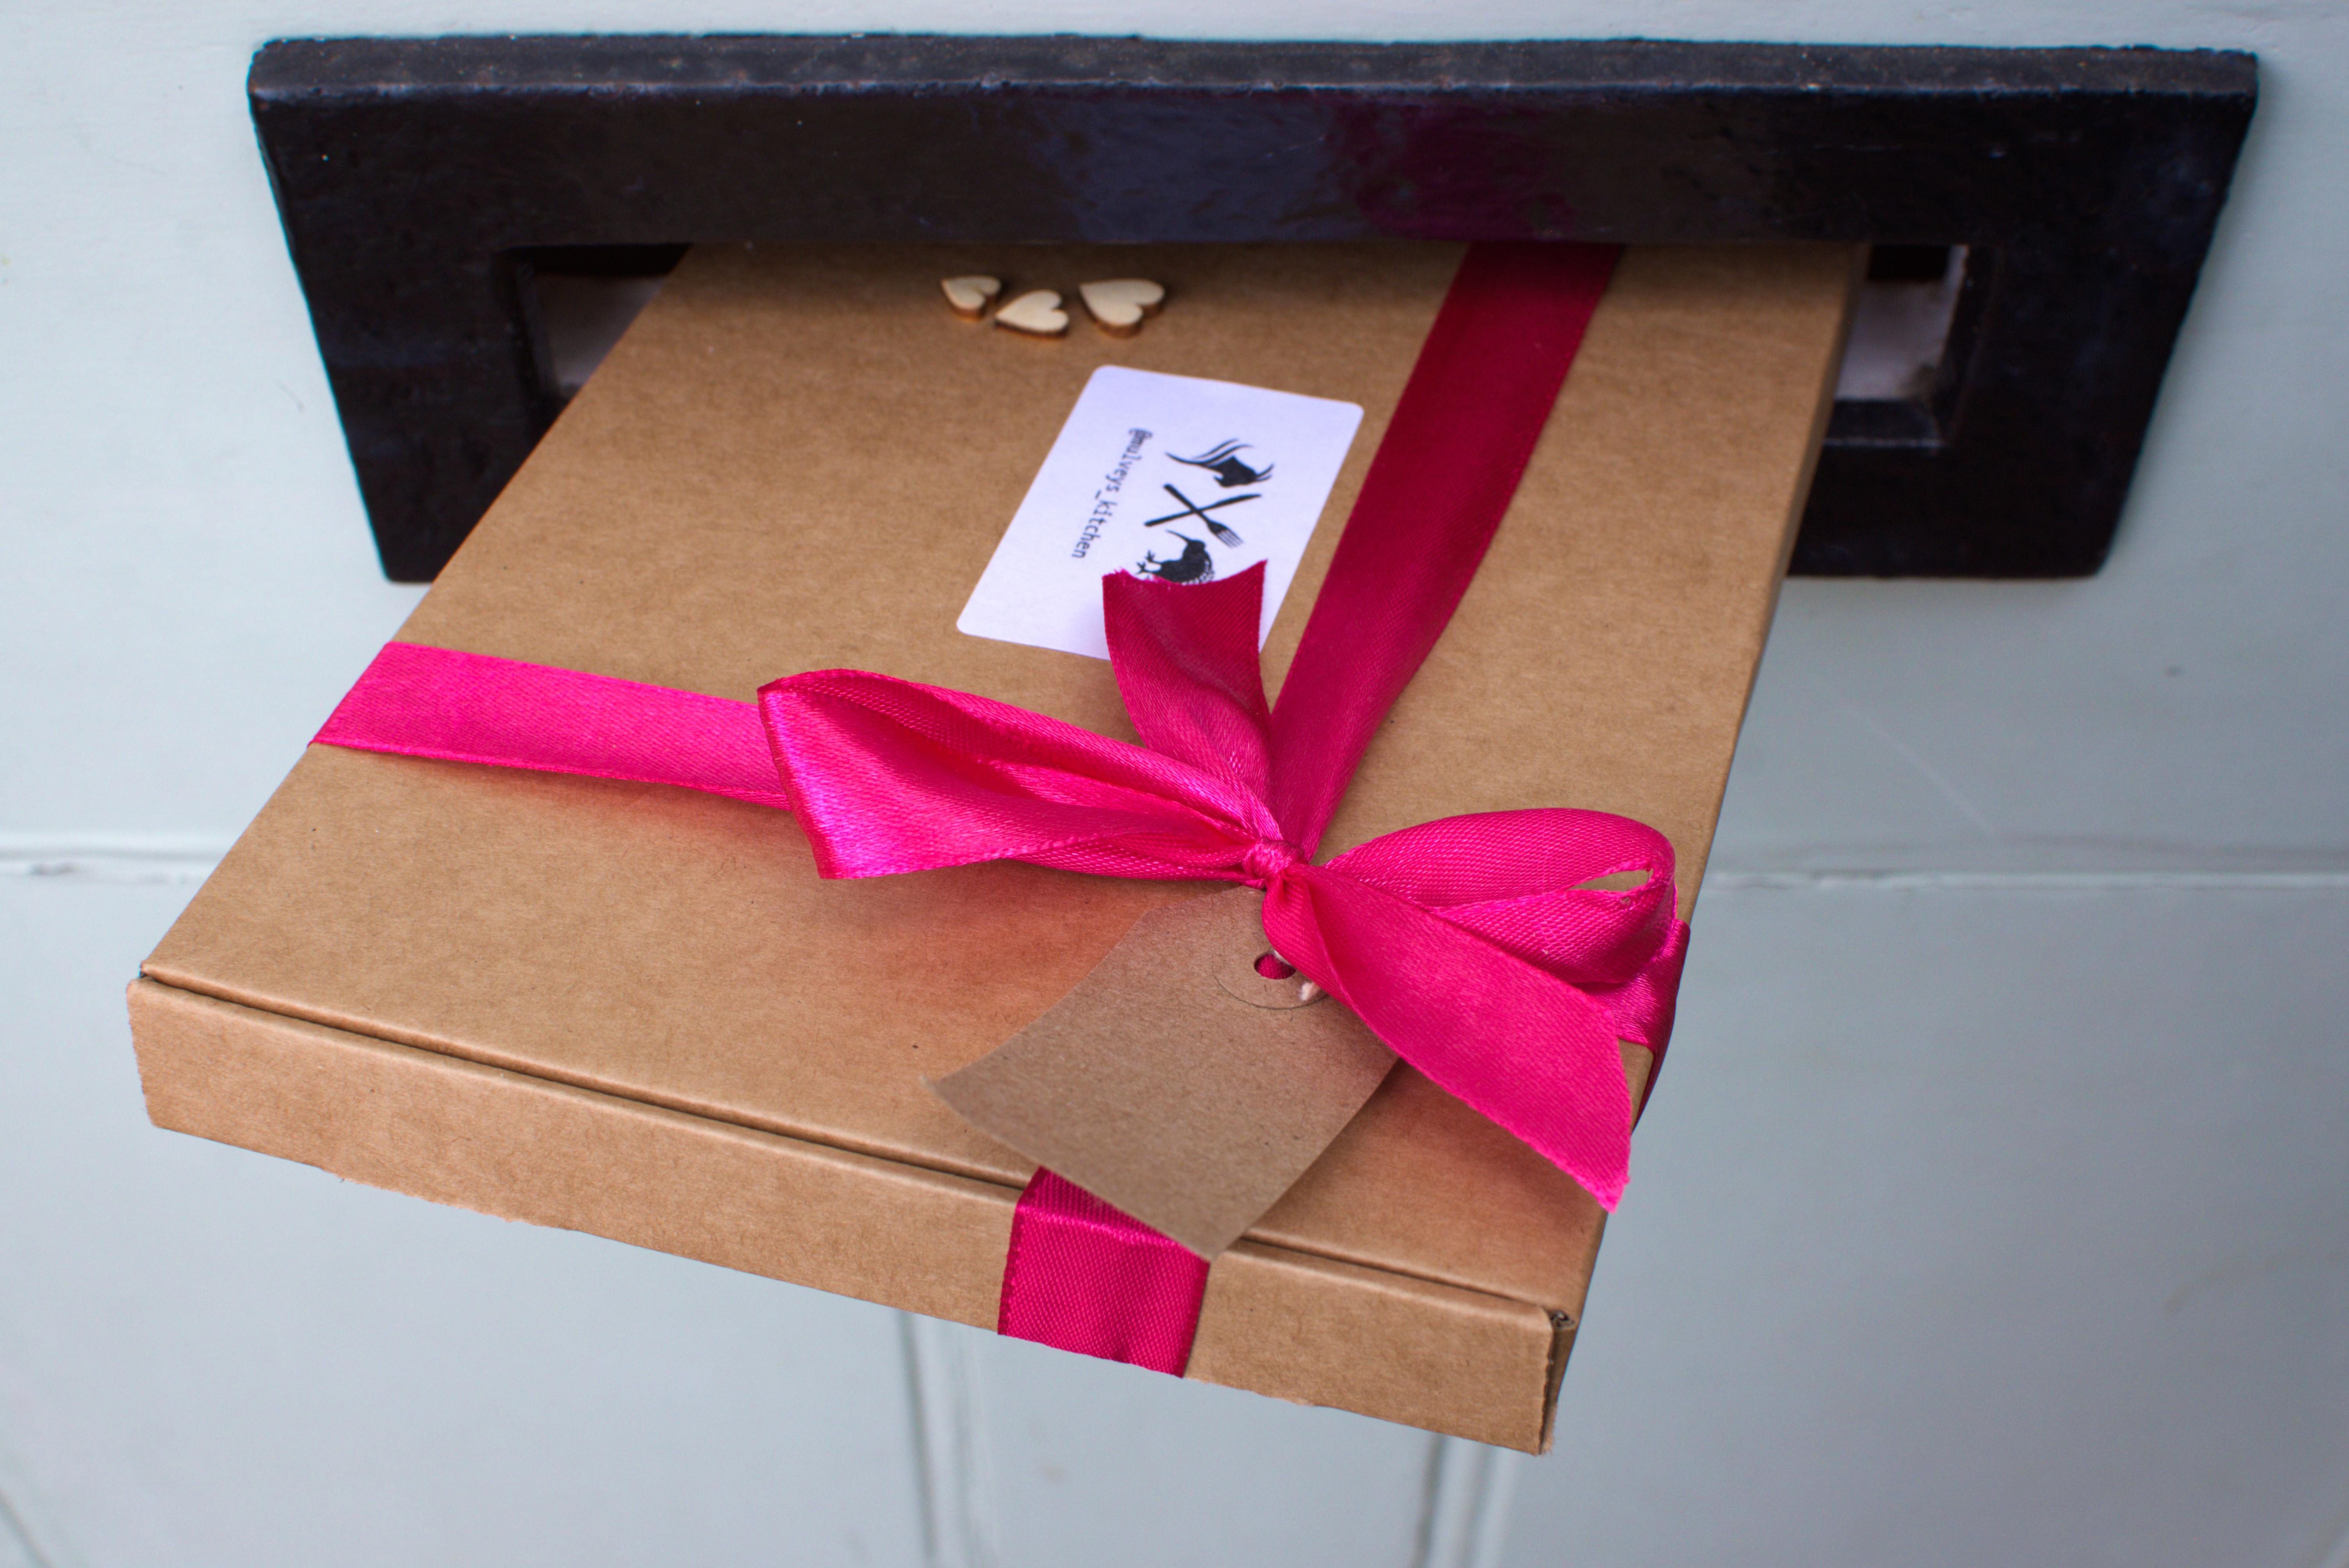 The romantic box